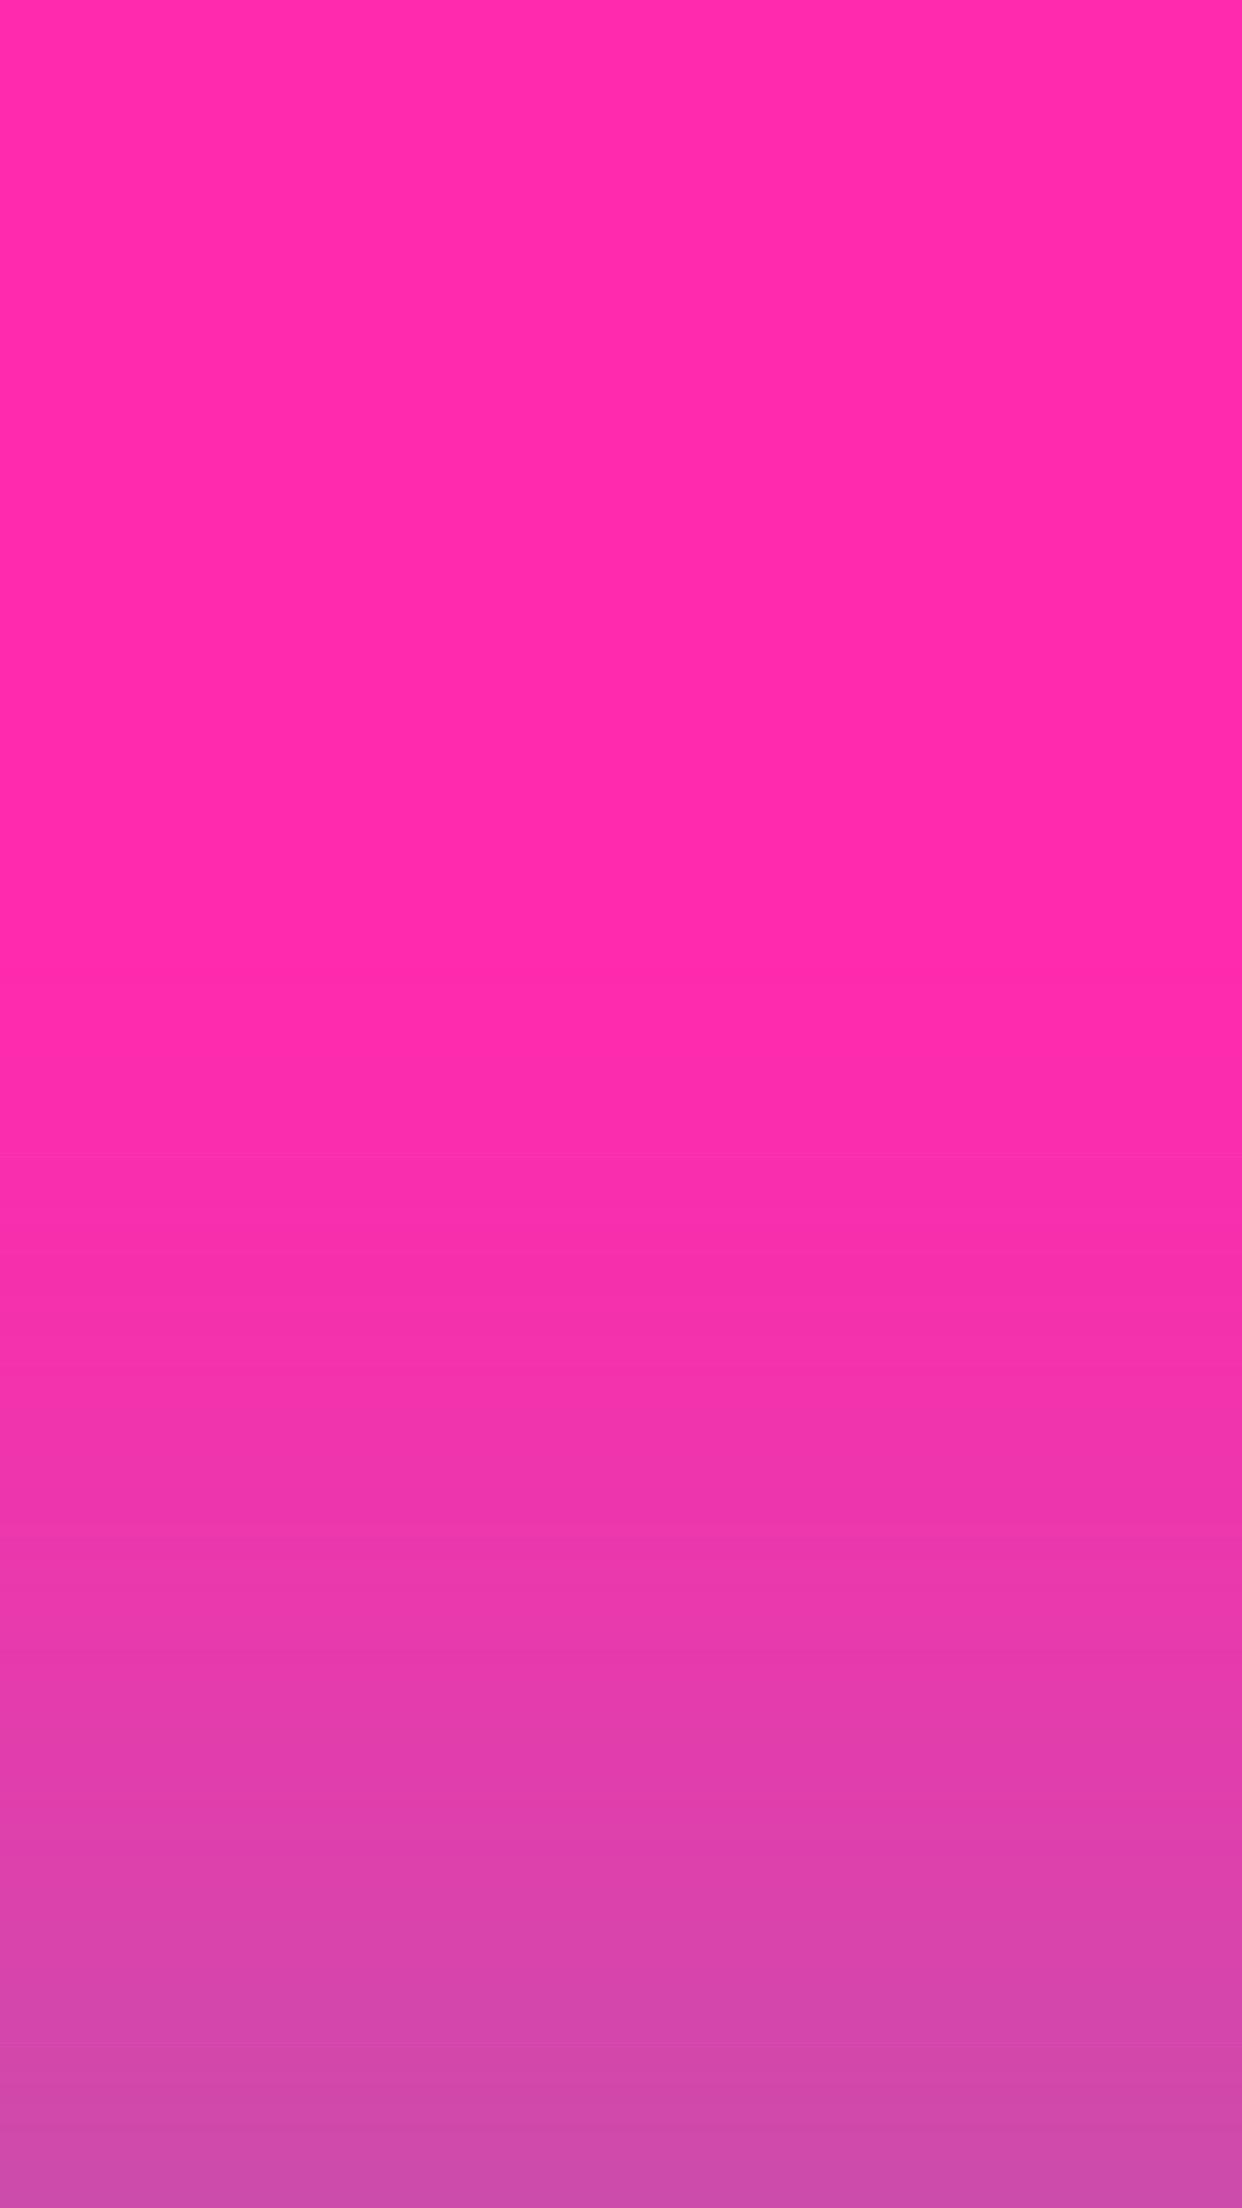 Wallpaper Iphone Ombre - wallpaper